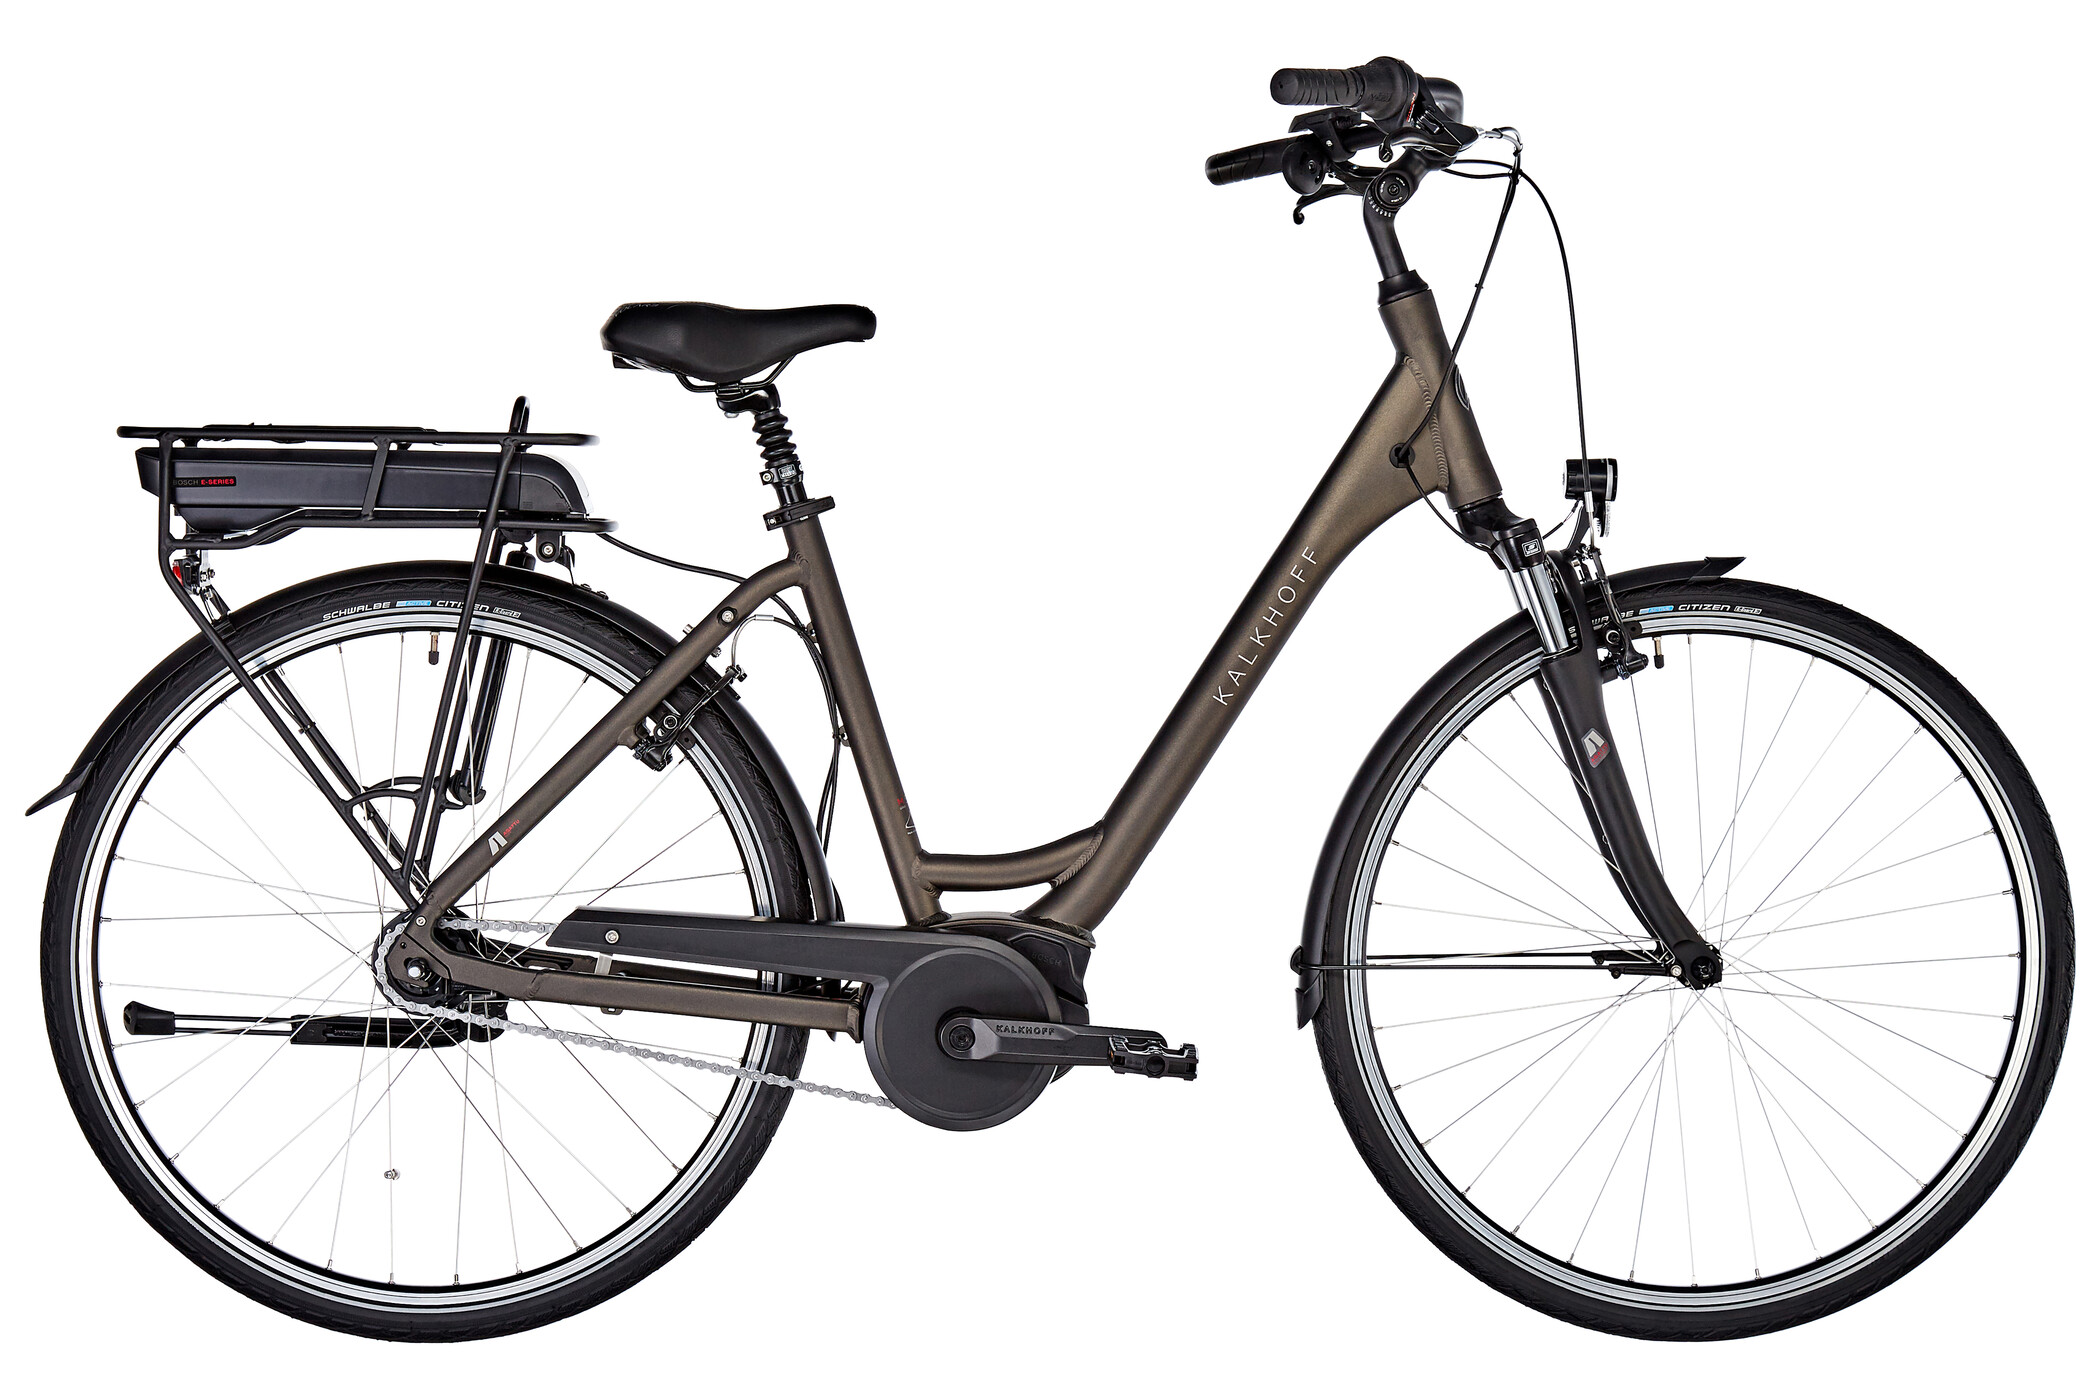 Kalkhoff Agattu 1.B Move E-citybike Wave 400Wh grå (2019) | City-cykler